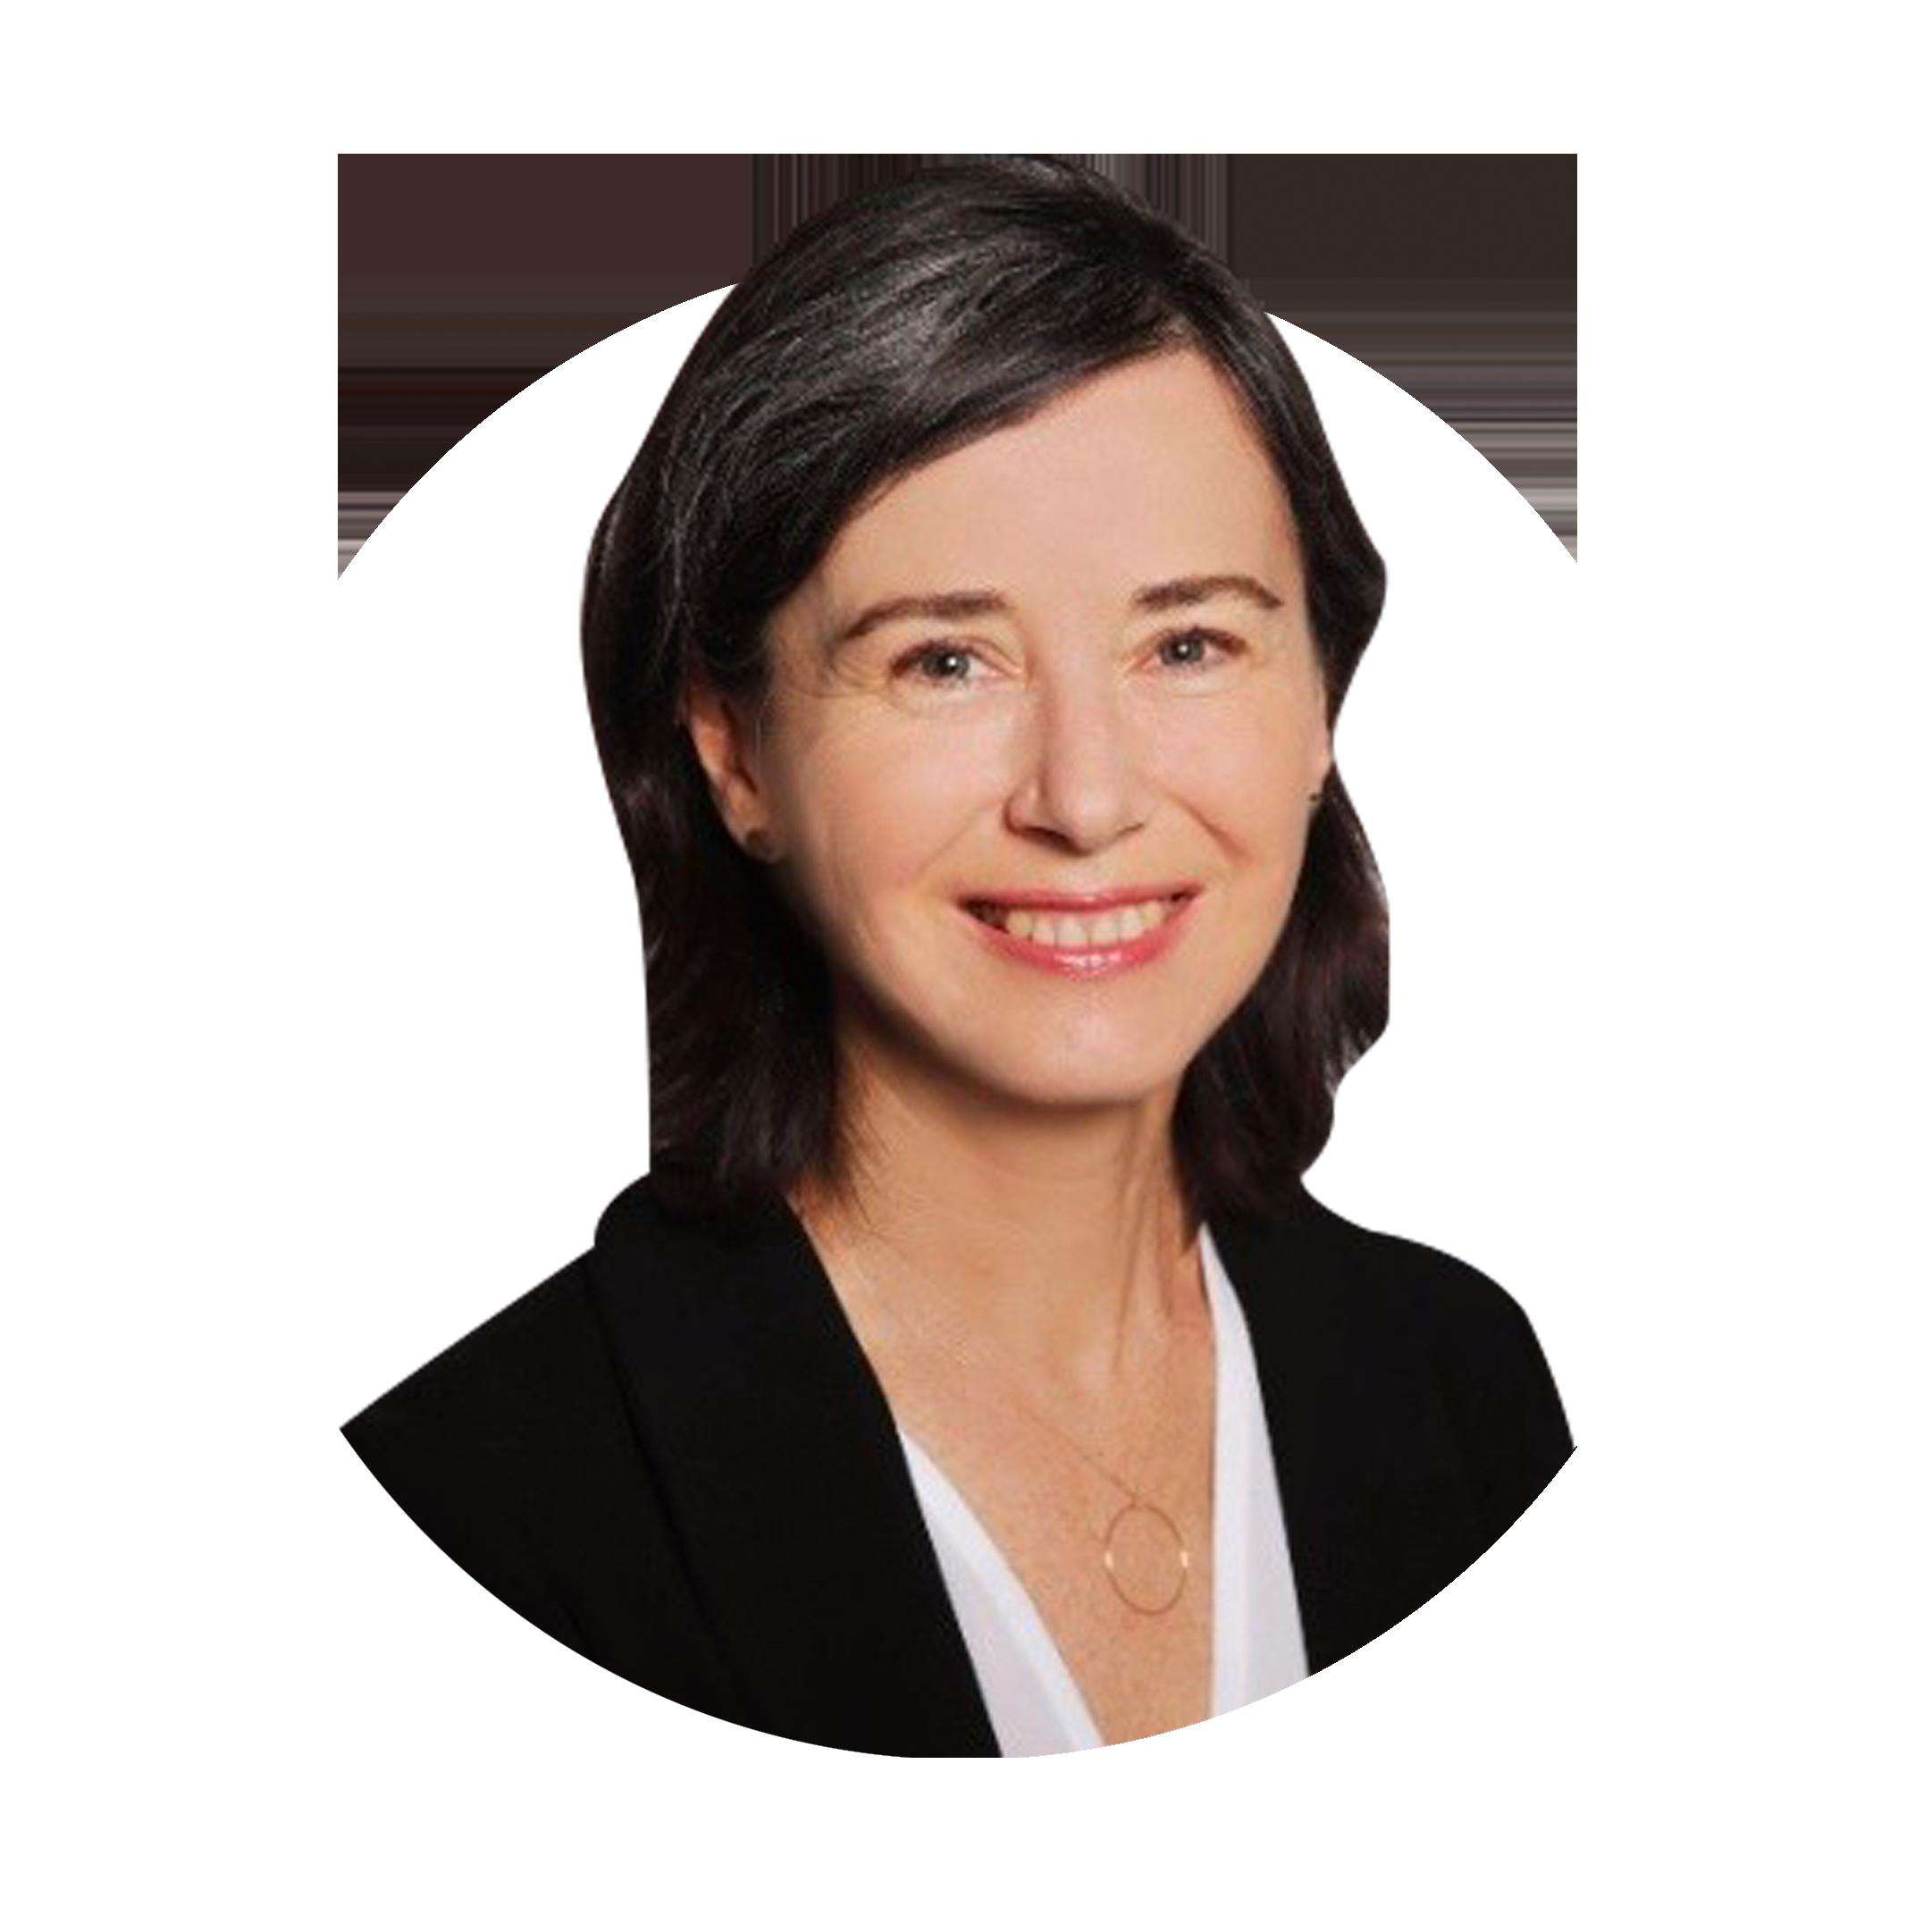 Sidekick profile Caroline Prier-Klein